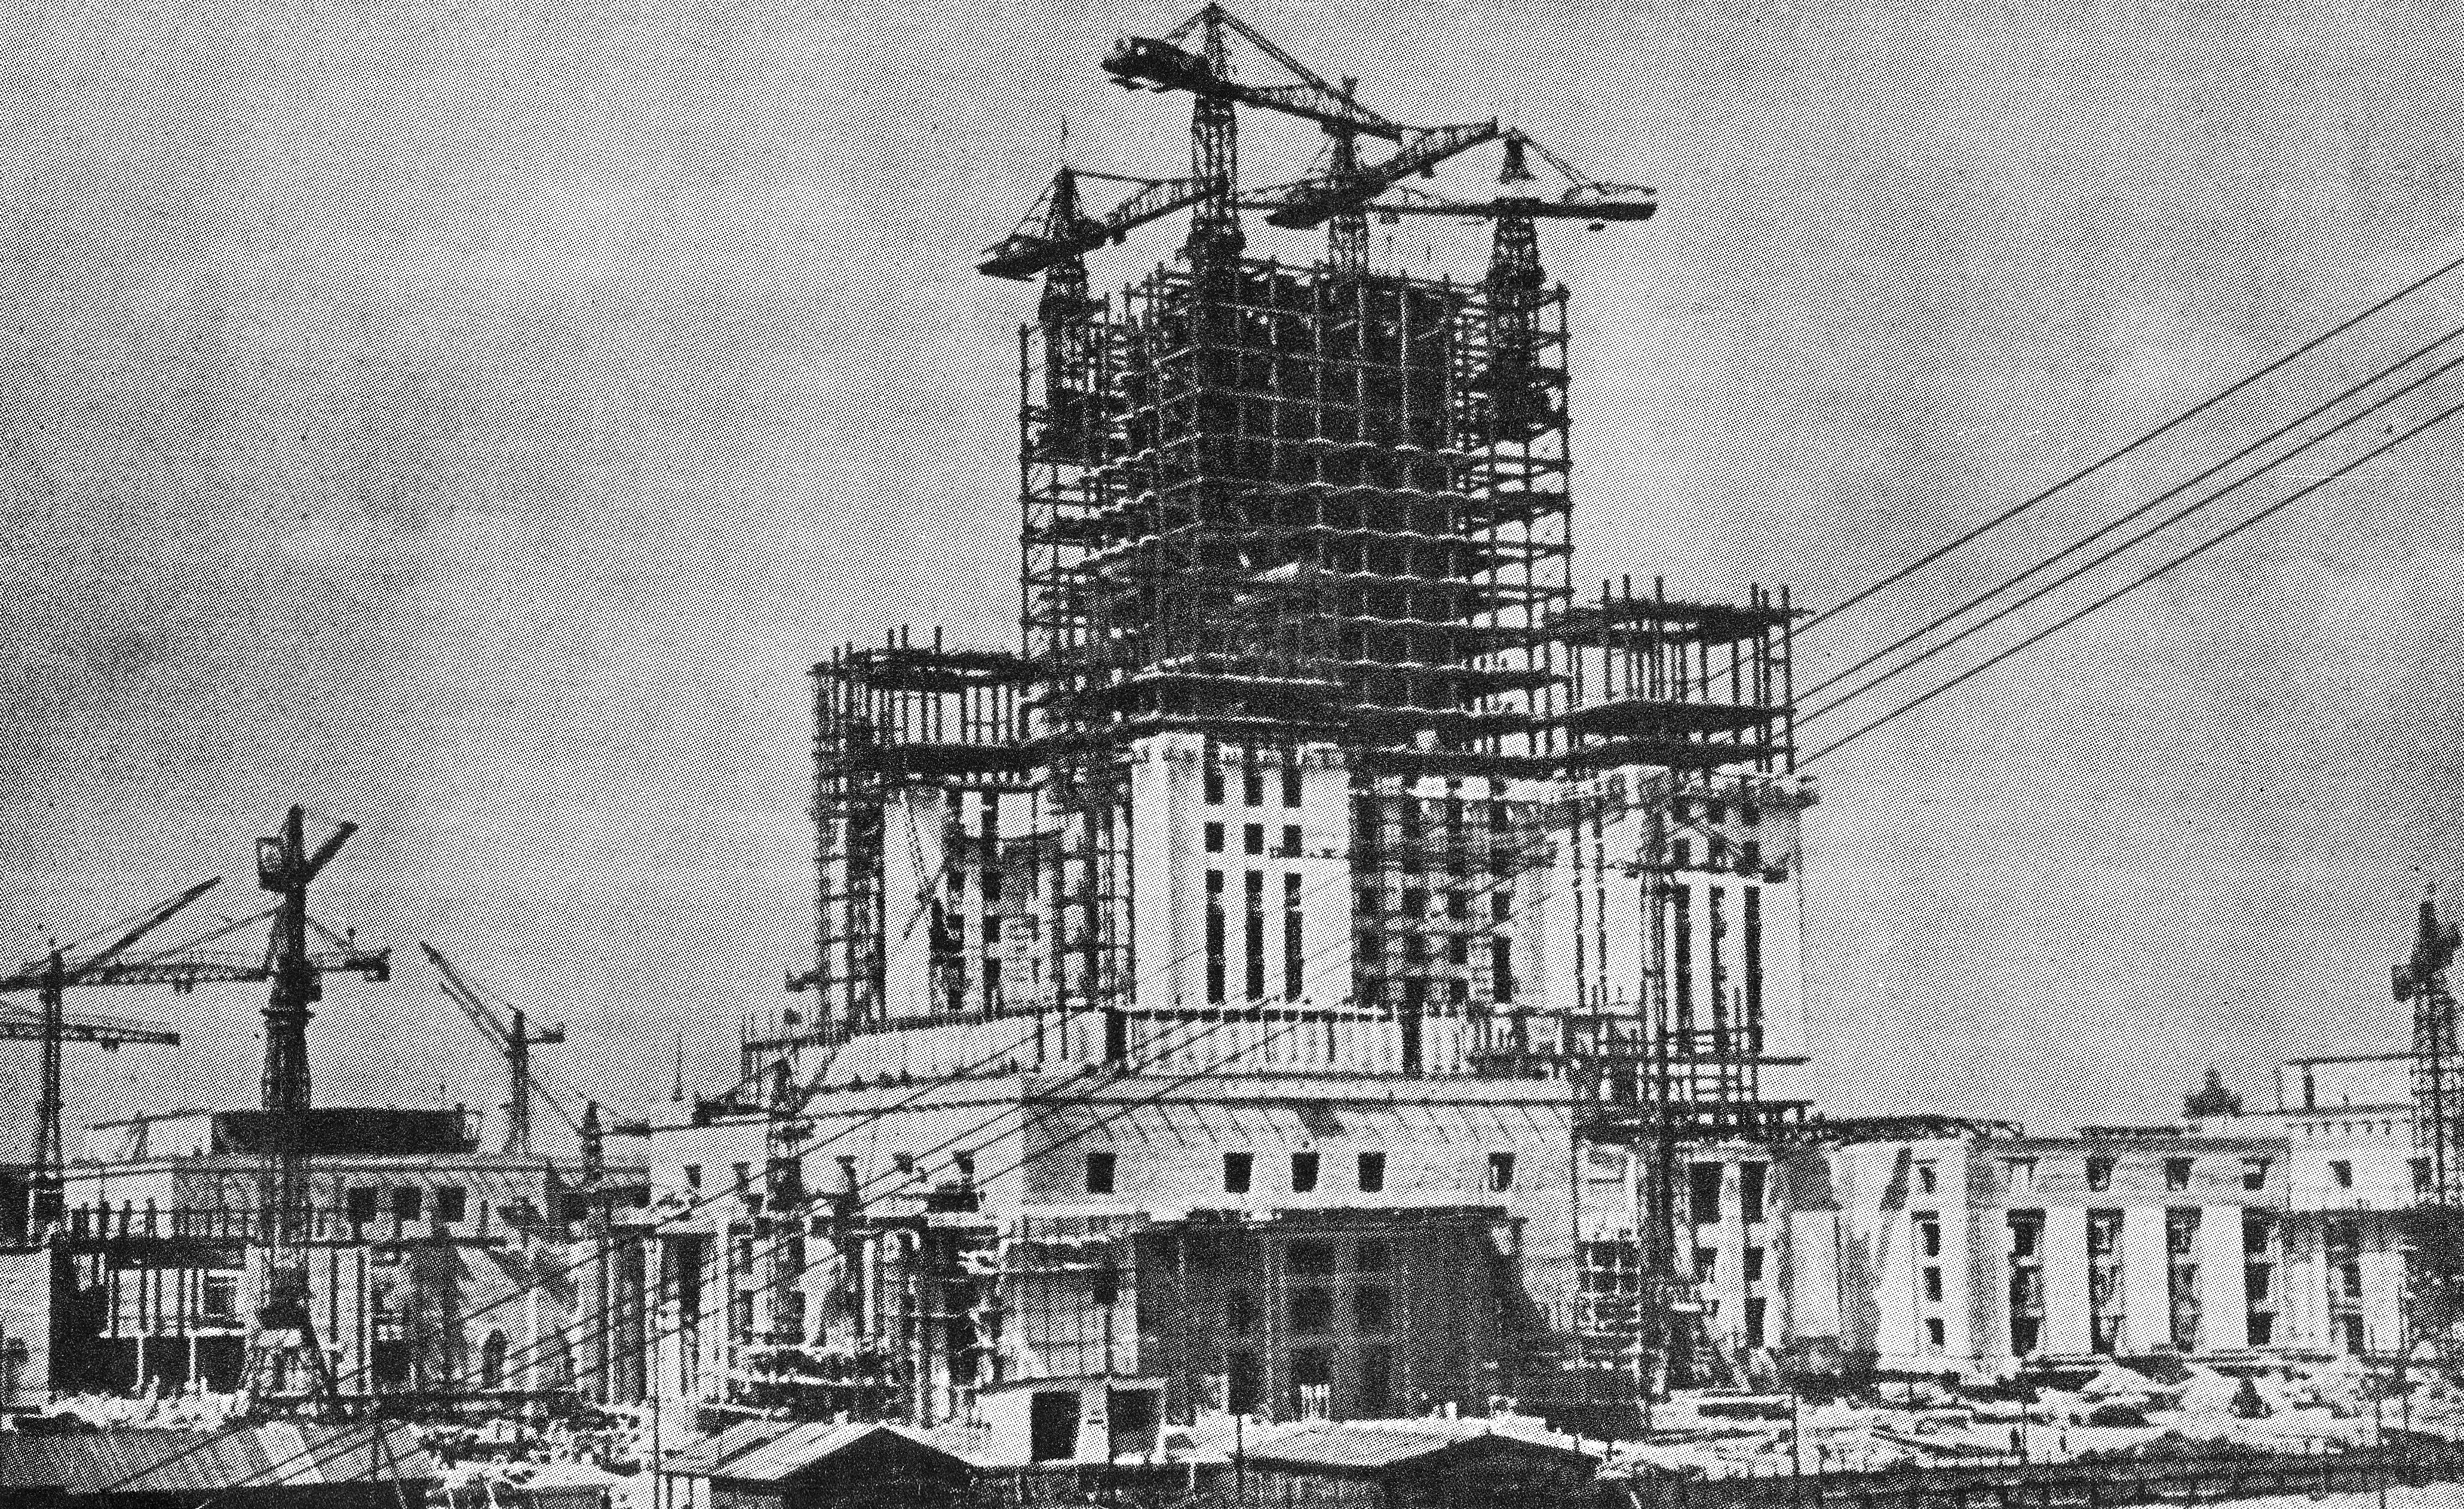 Budowa_Pałacu_Kultury_i_Nauki_001